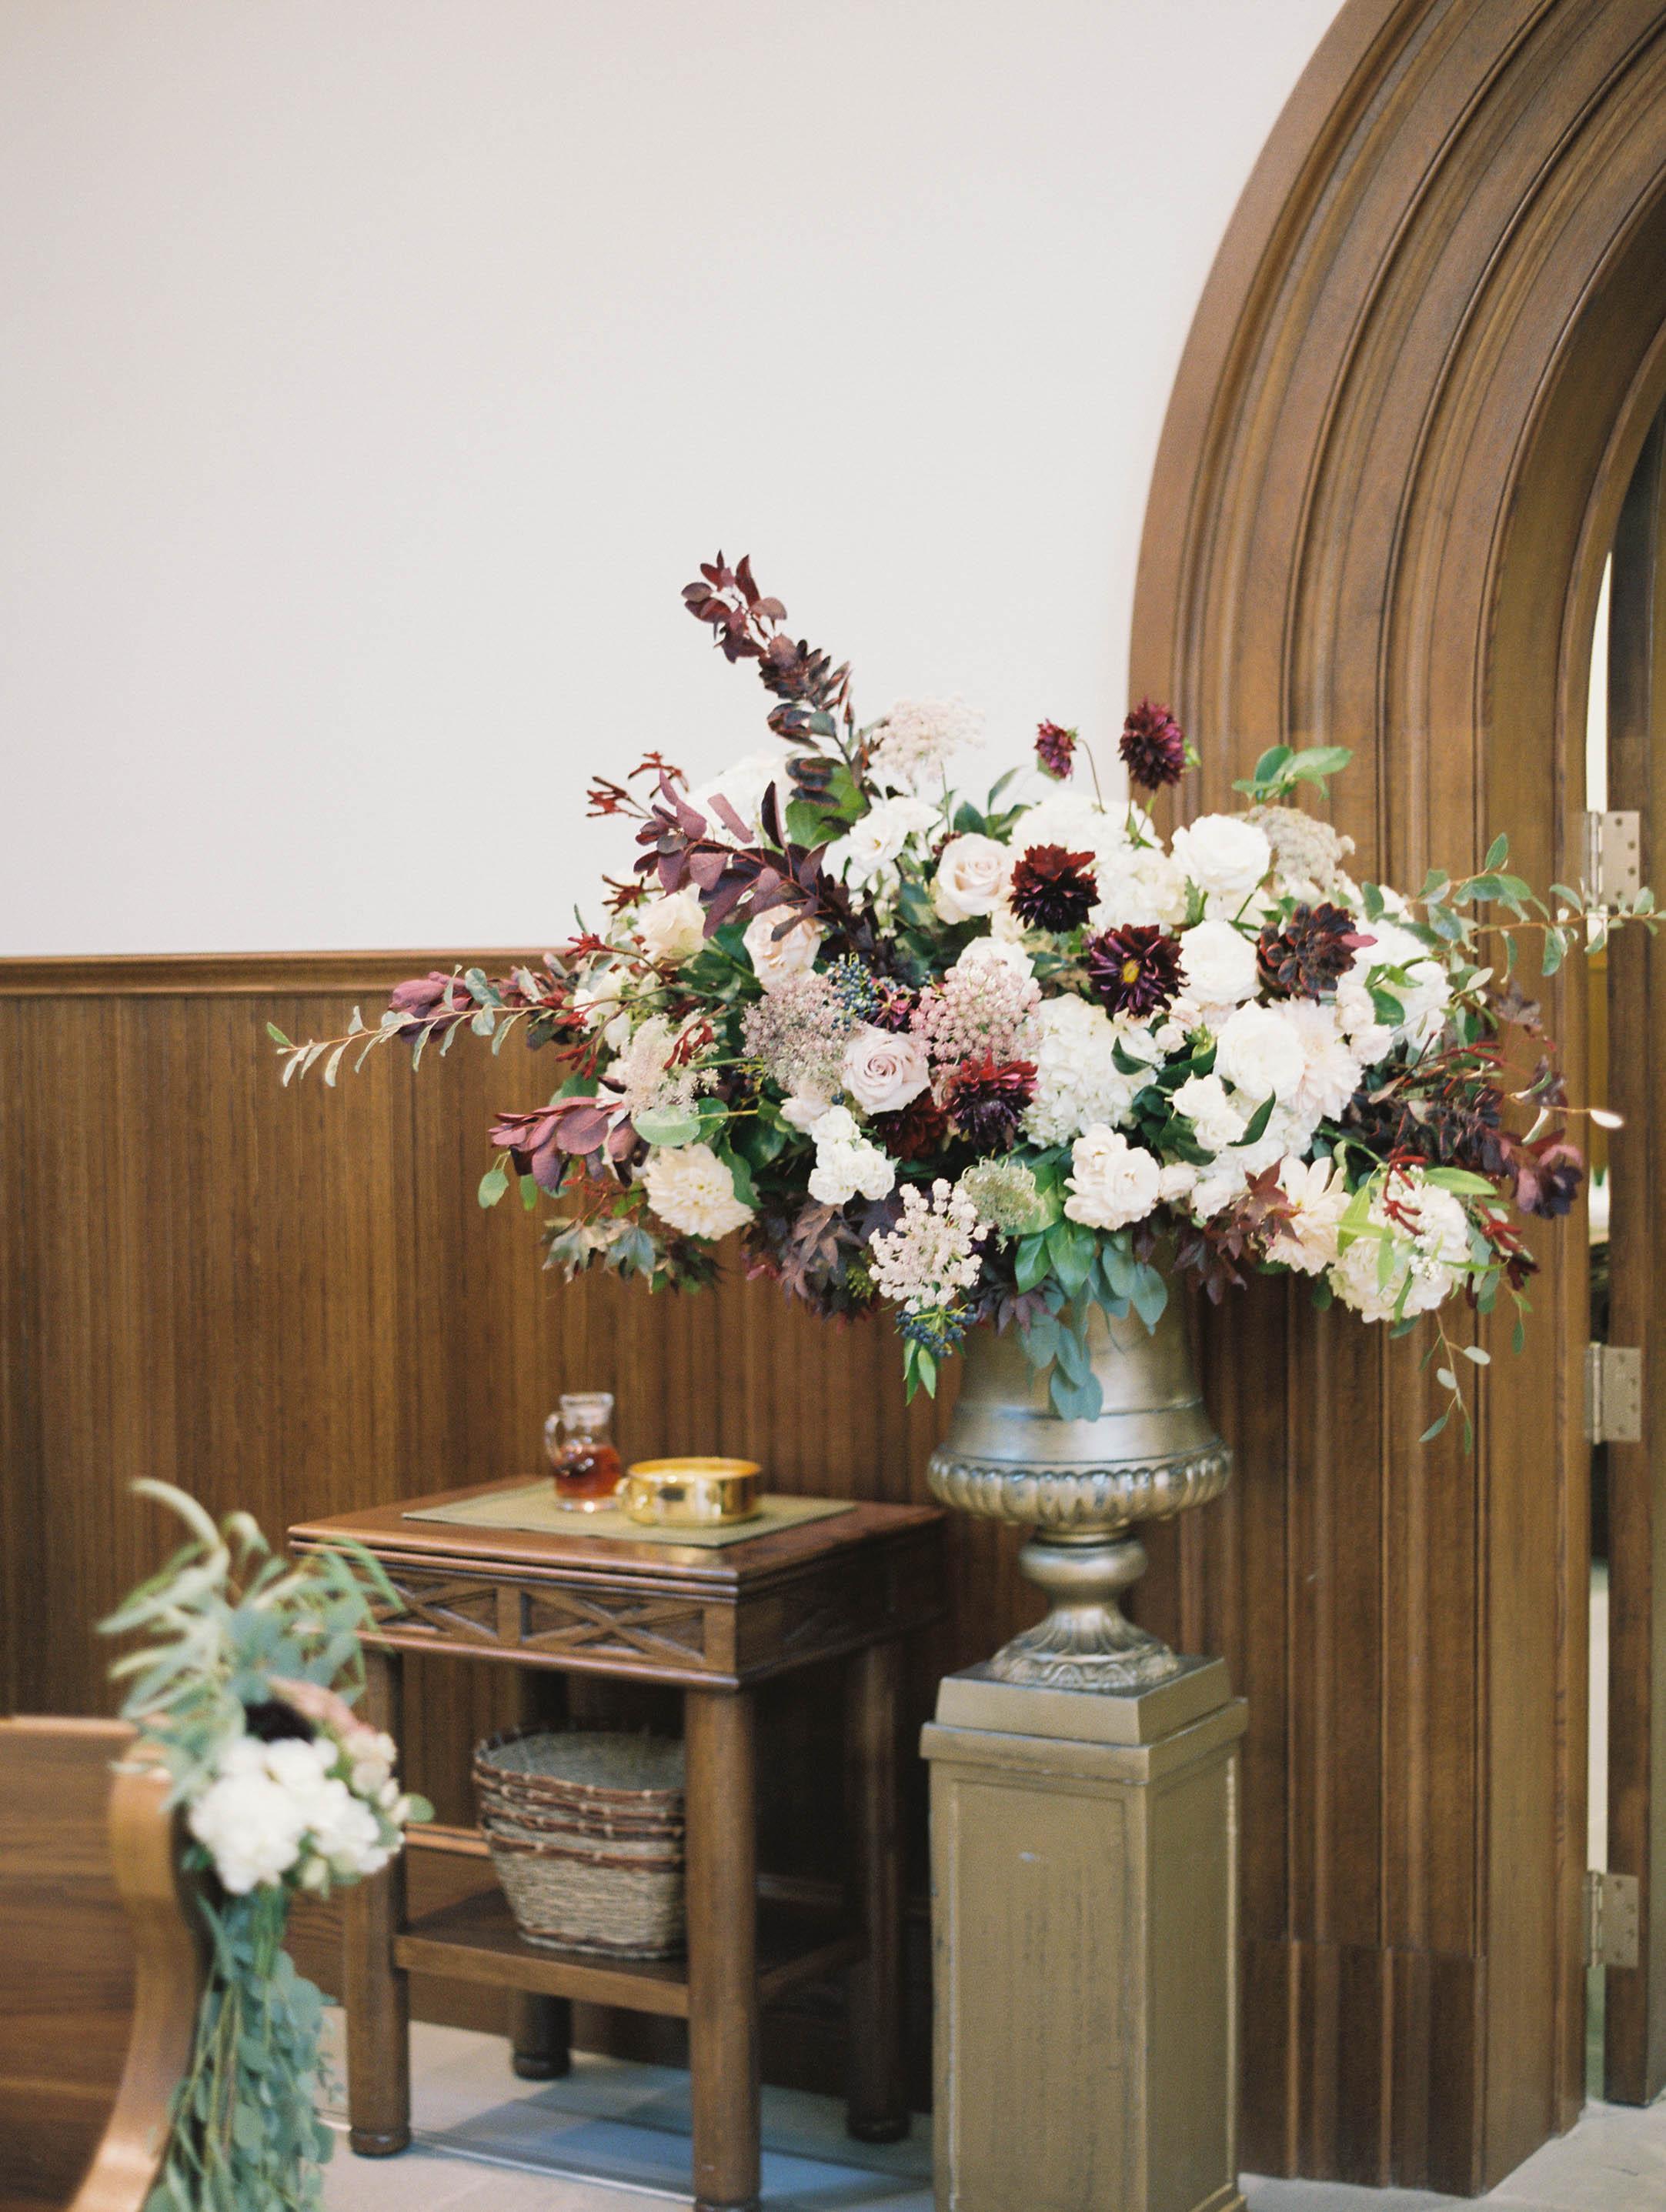 kelsandmichael_weddingphotography_rhodeislandwedding-8.jpg